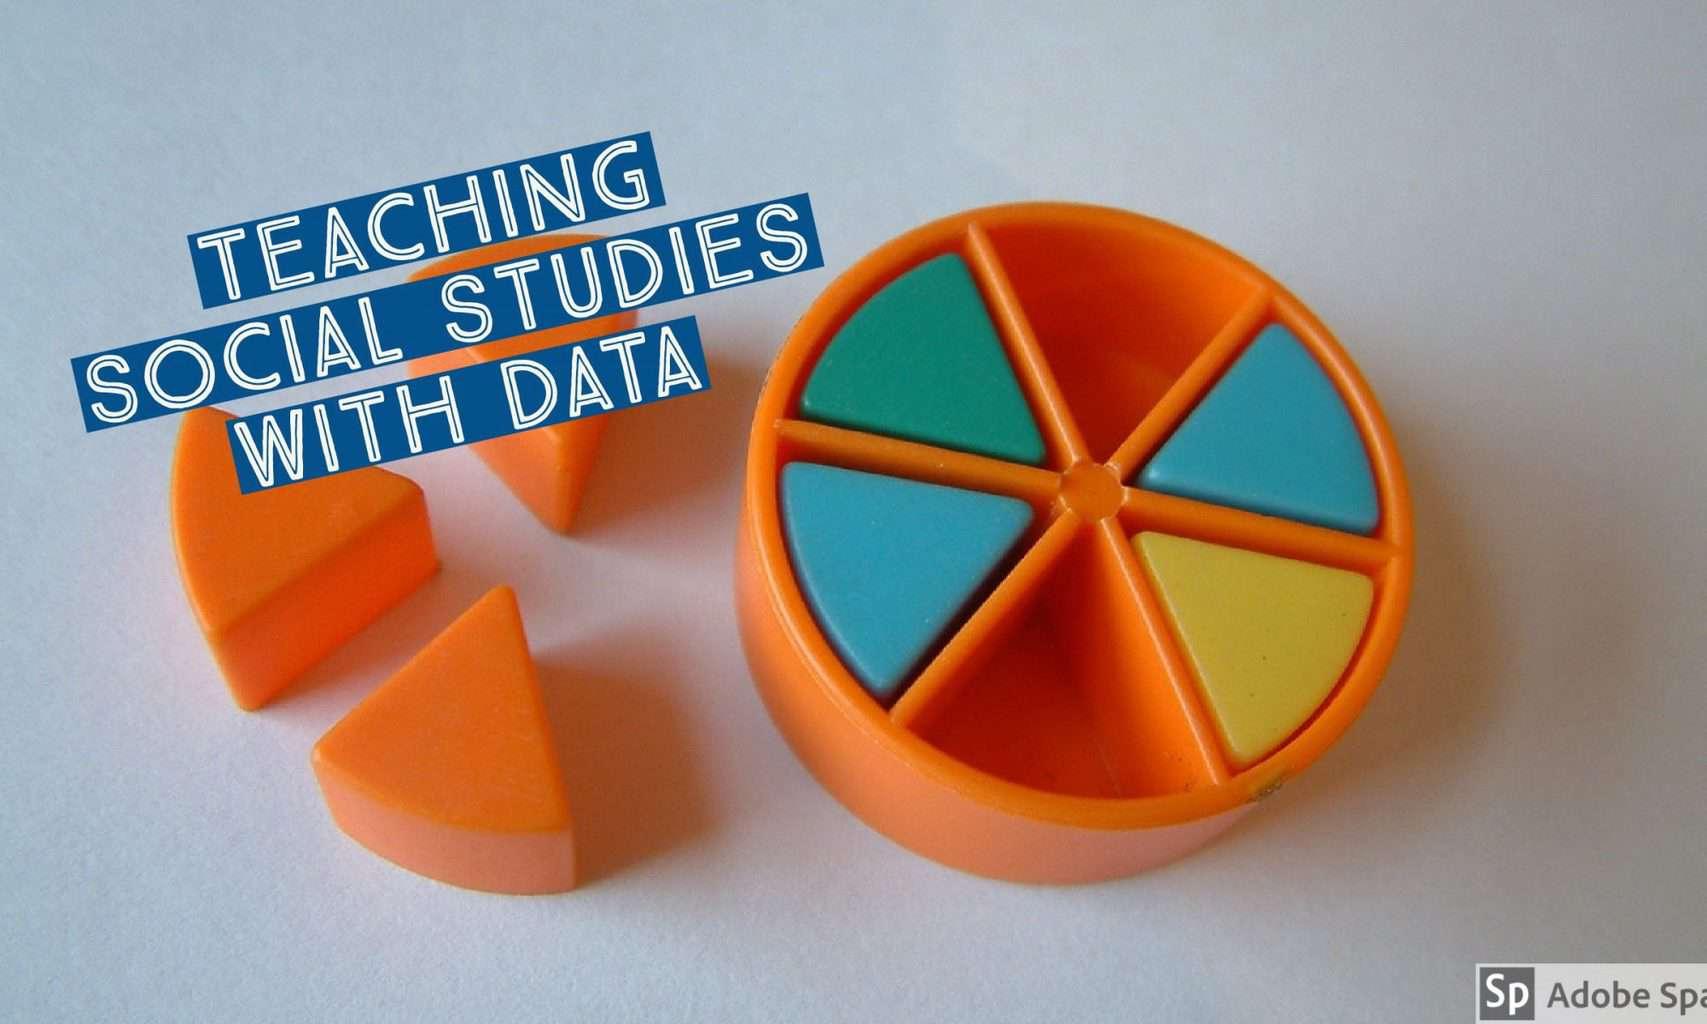 Teaching Social Studies with Data